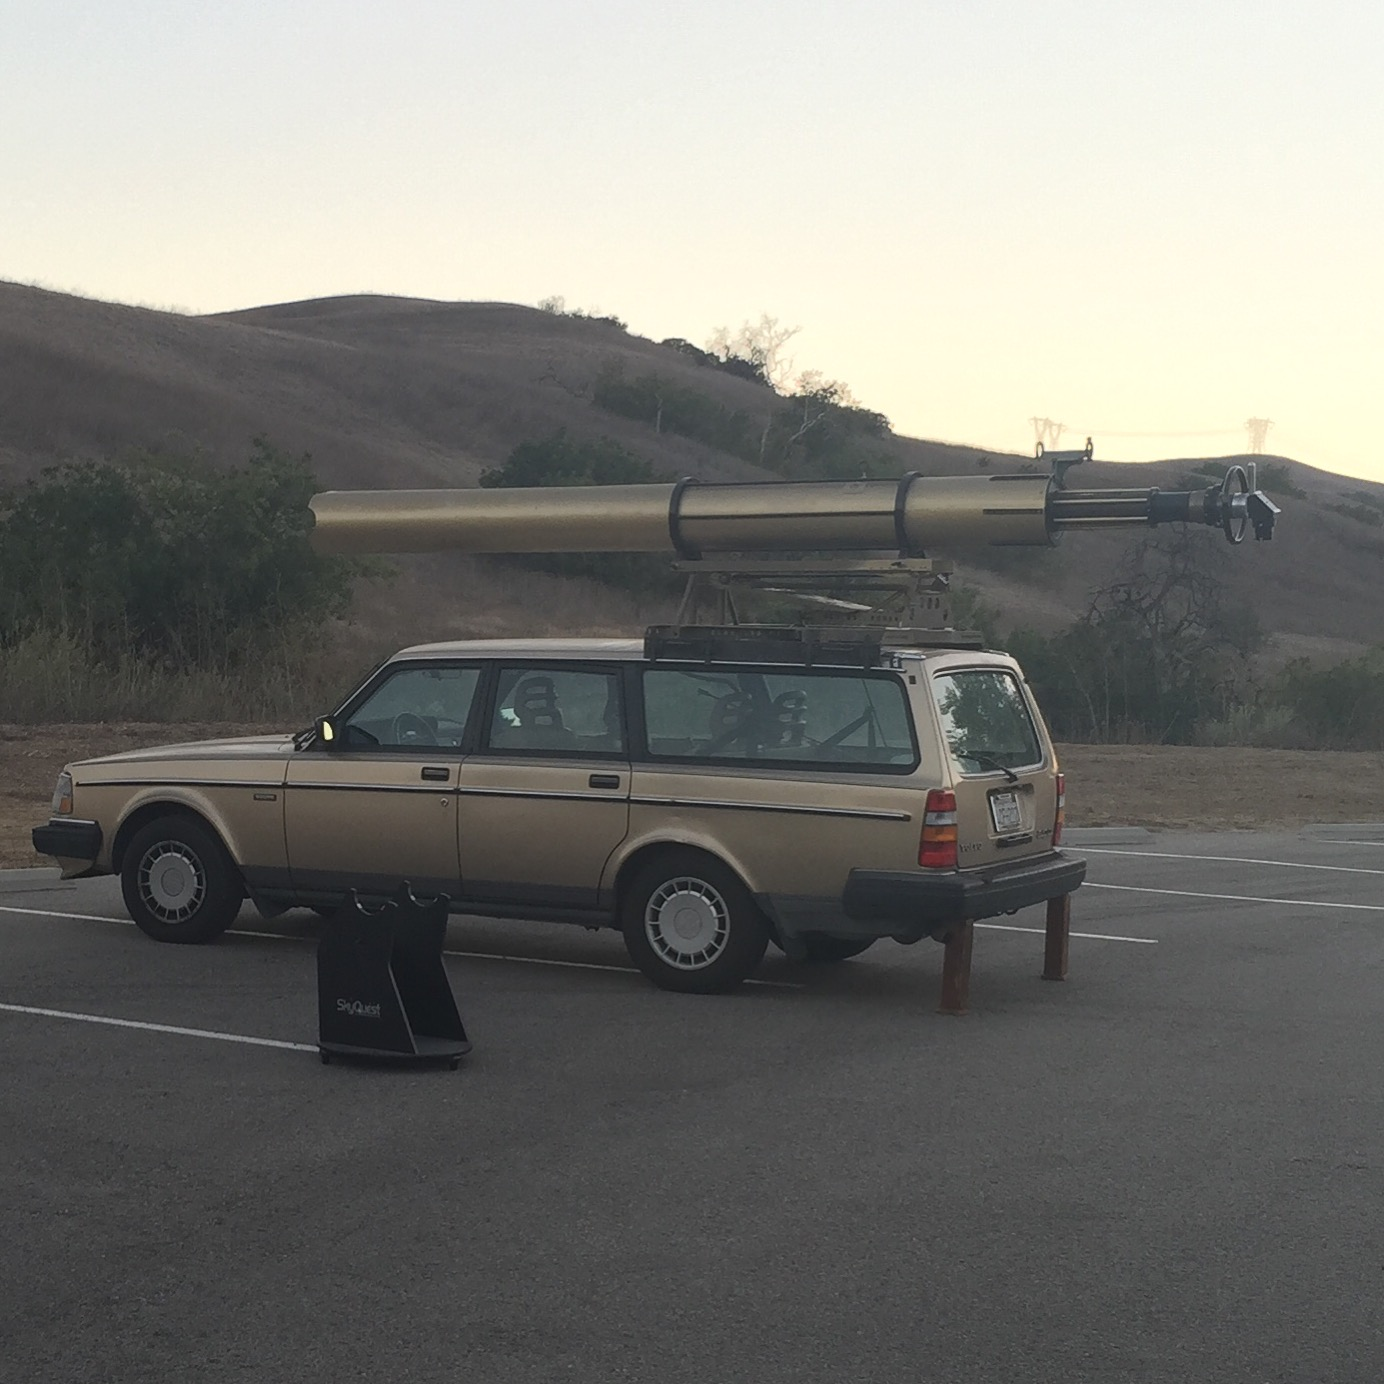 Pomona valley amateur astronomers